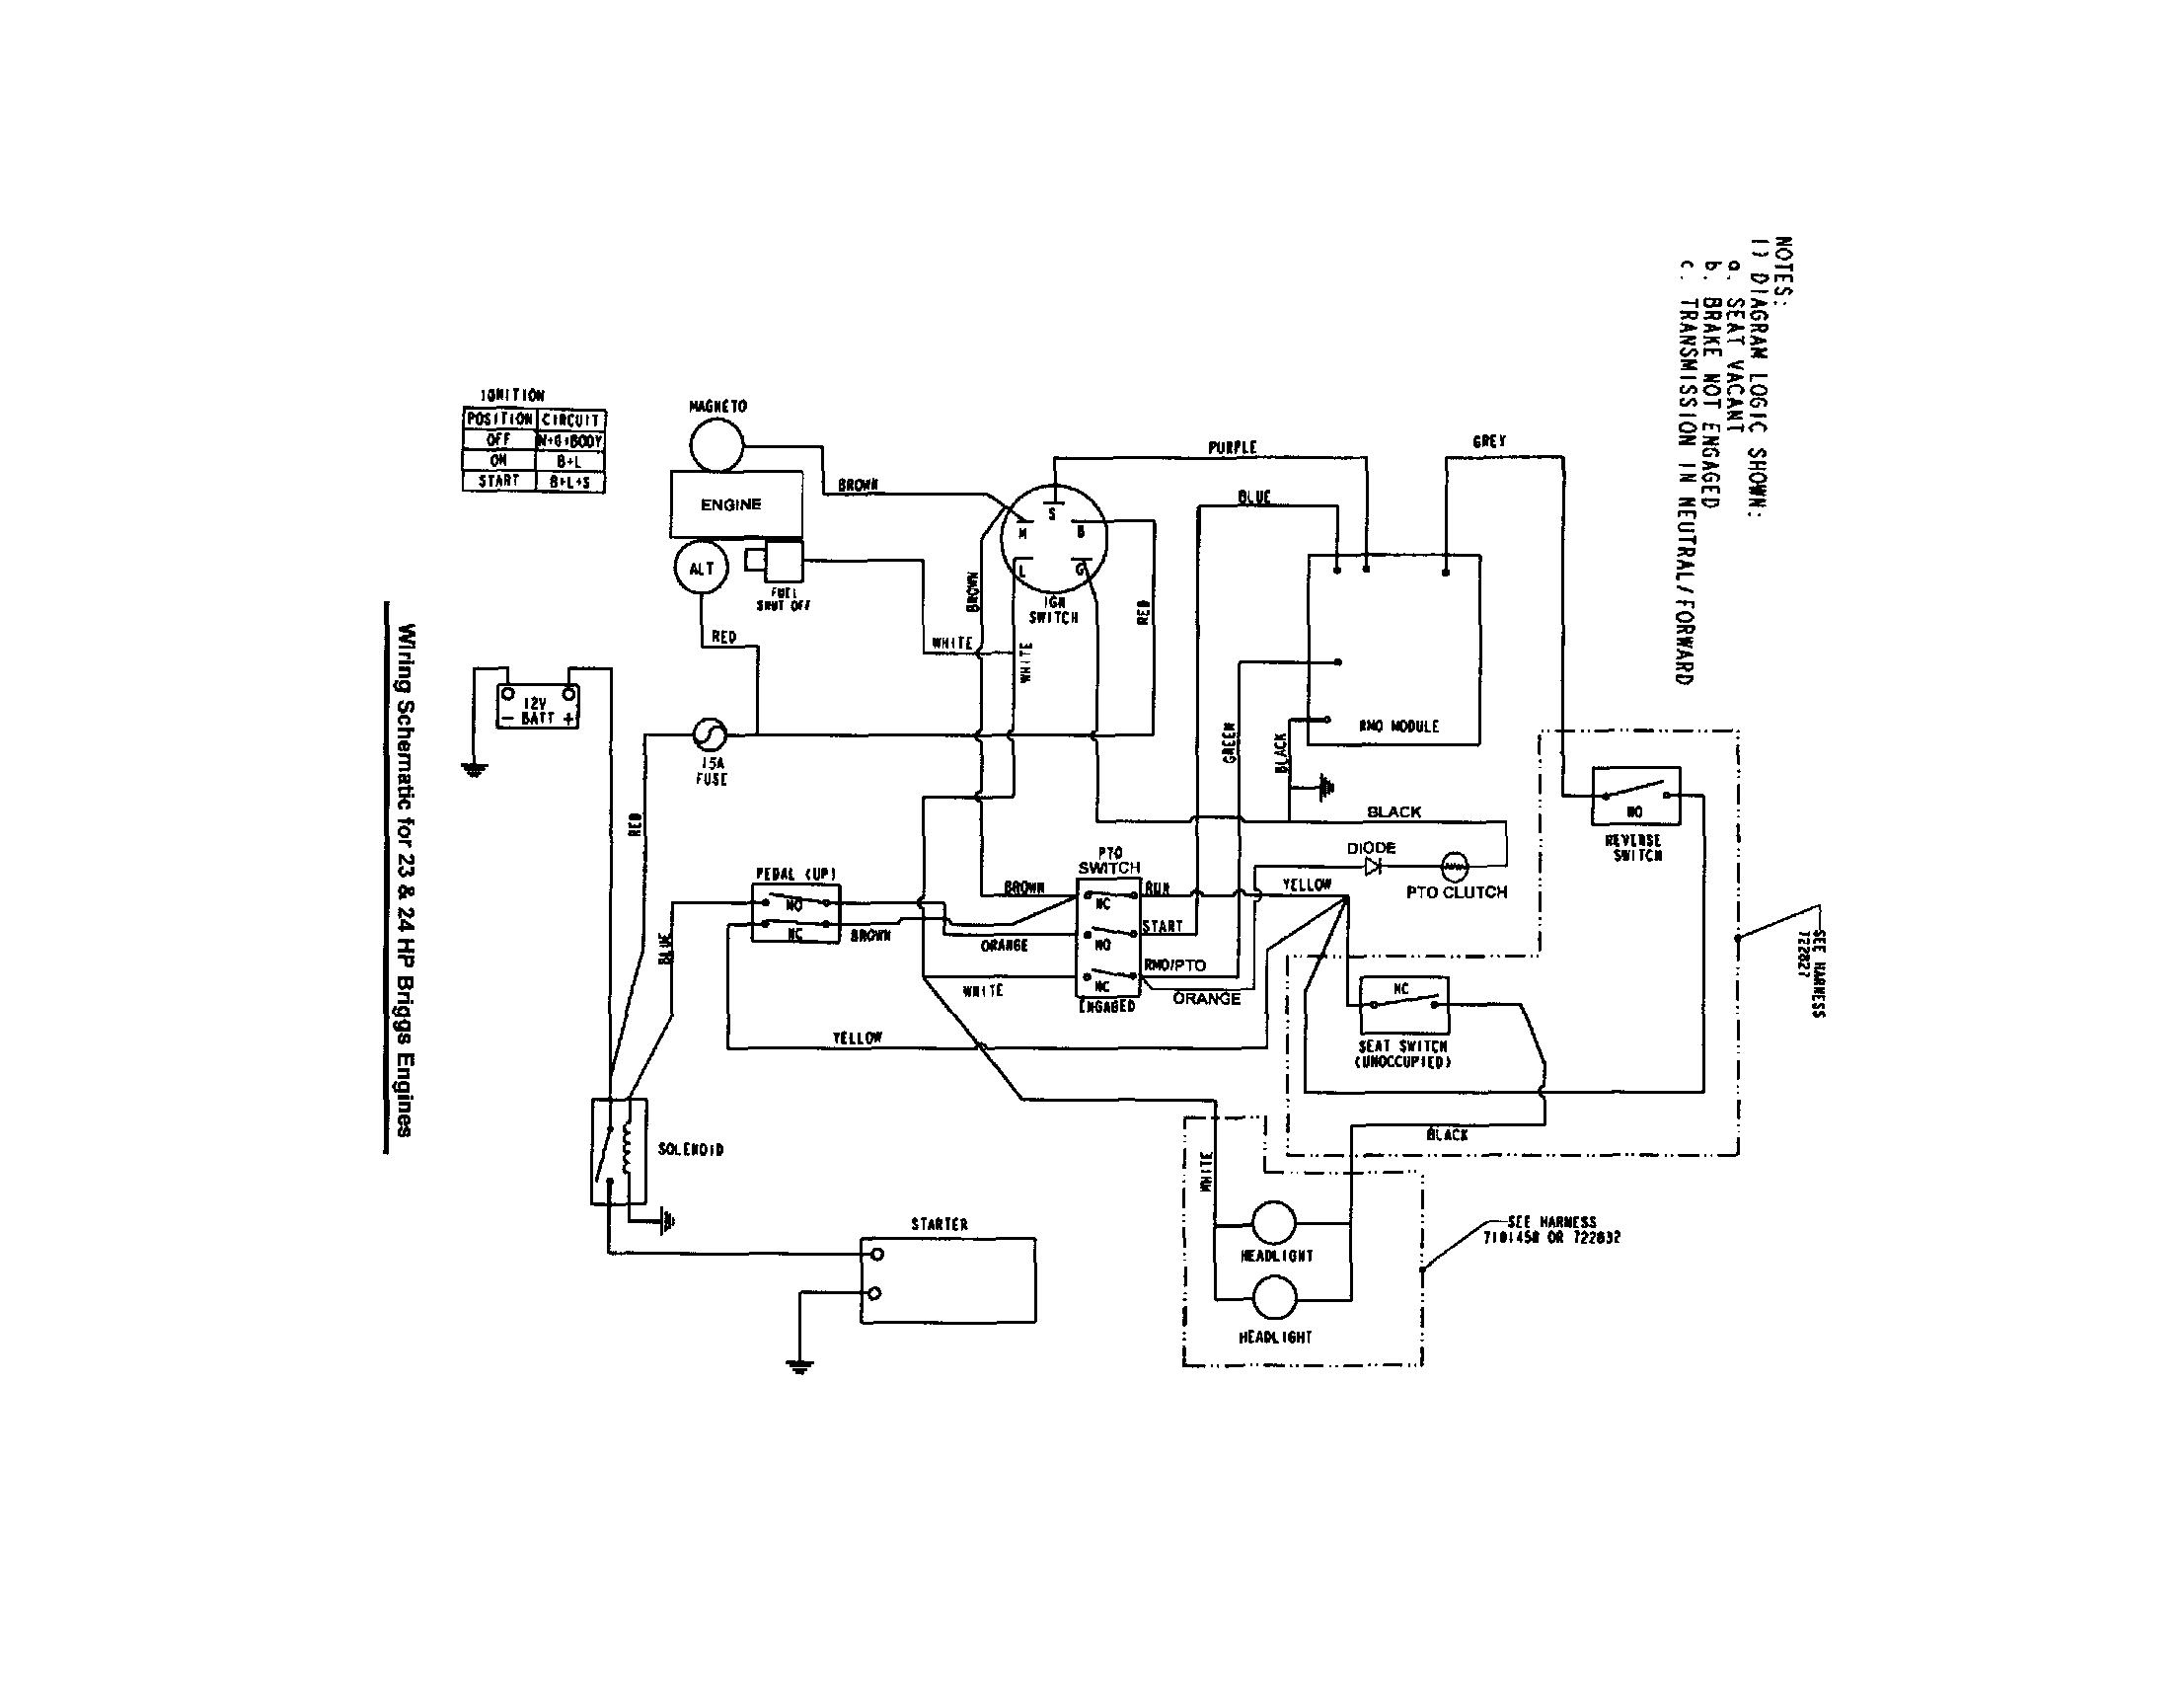 snapper lt160h42cbv2 wiring harness wiring diagram 15488 snapper wiring harness [ 2213 x 1714 Pixel ]